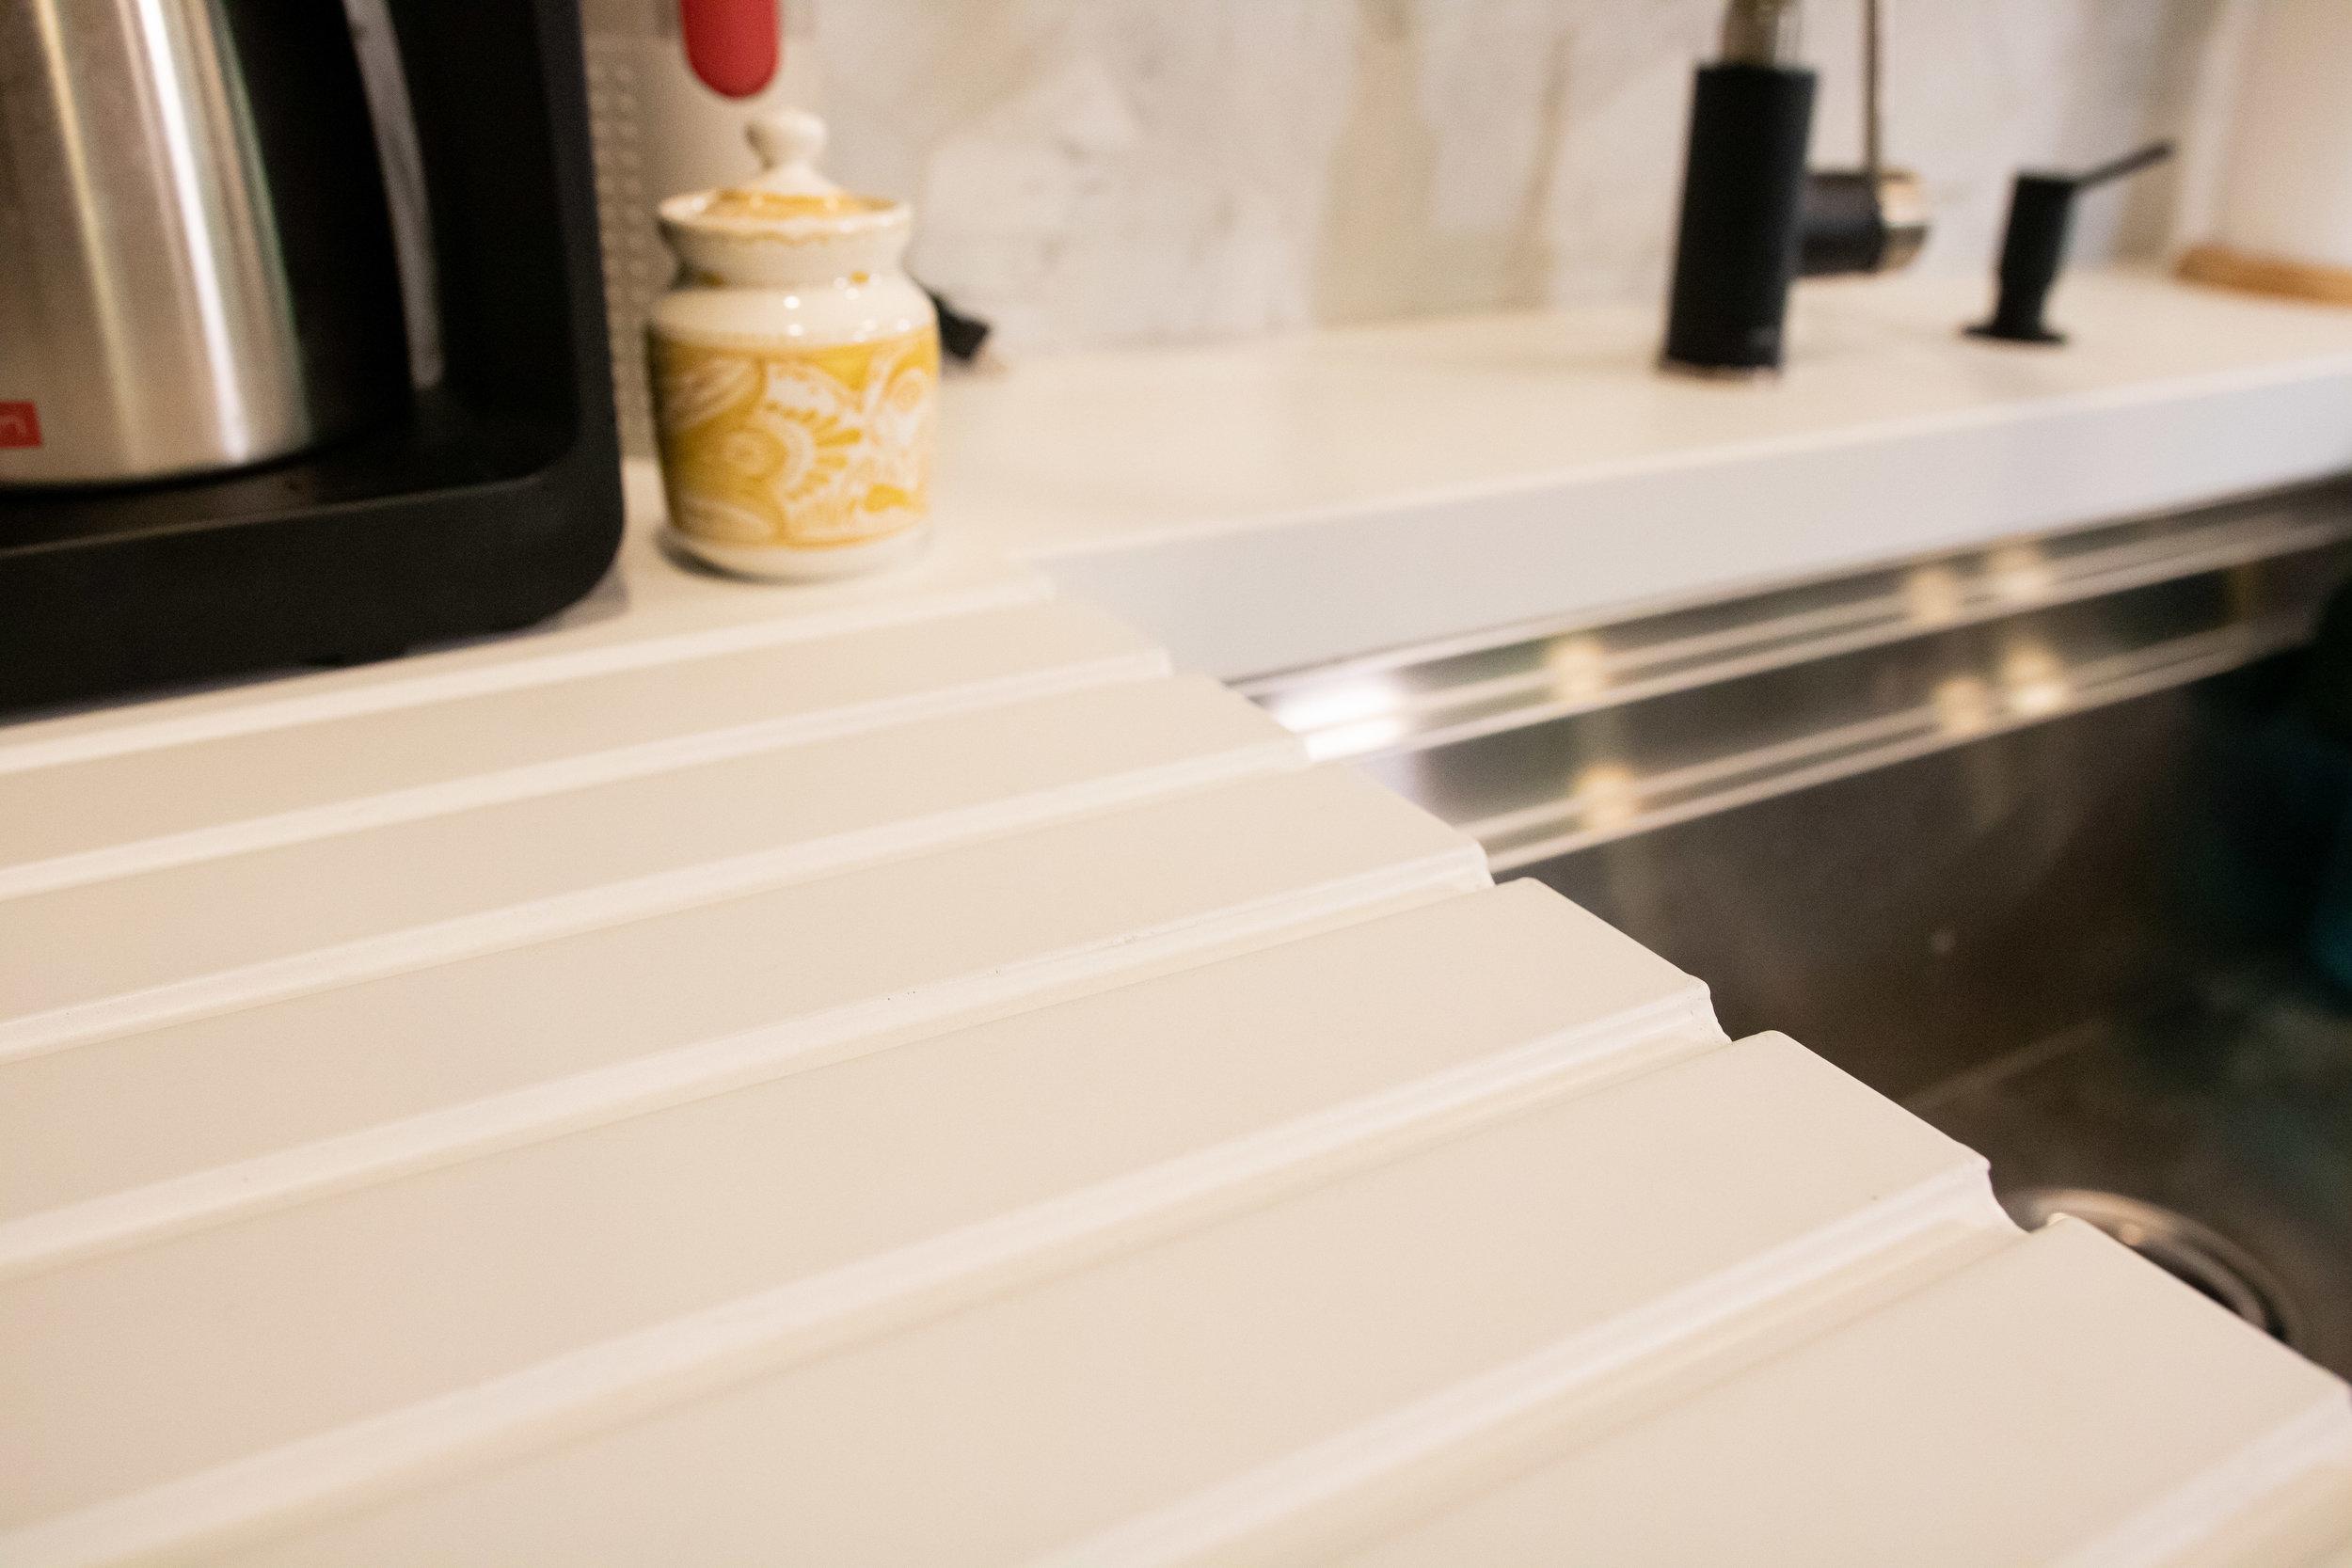 5300-countertop-kitchen-11.jpg